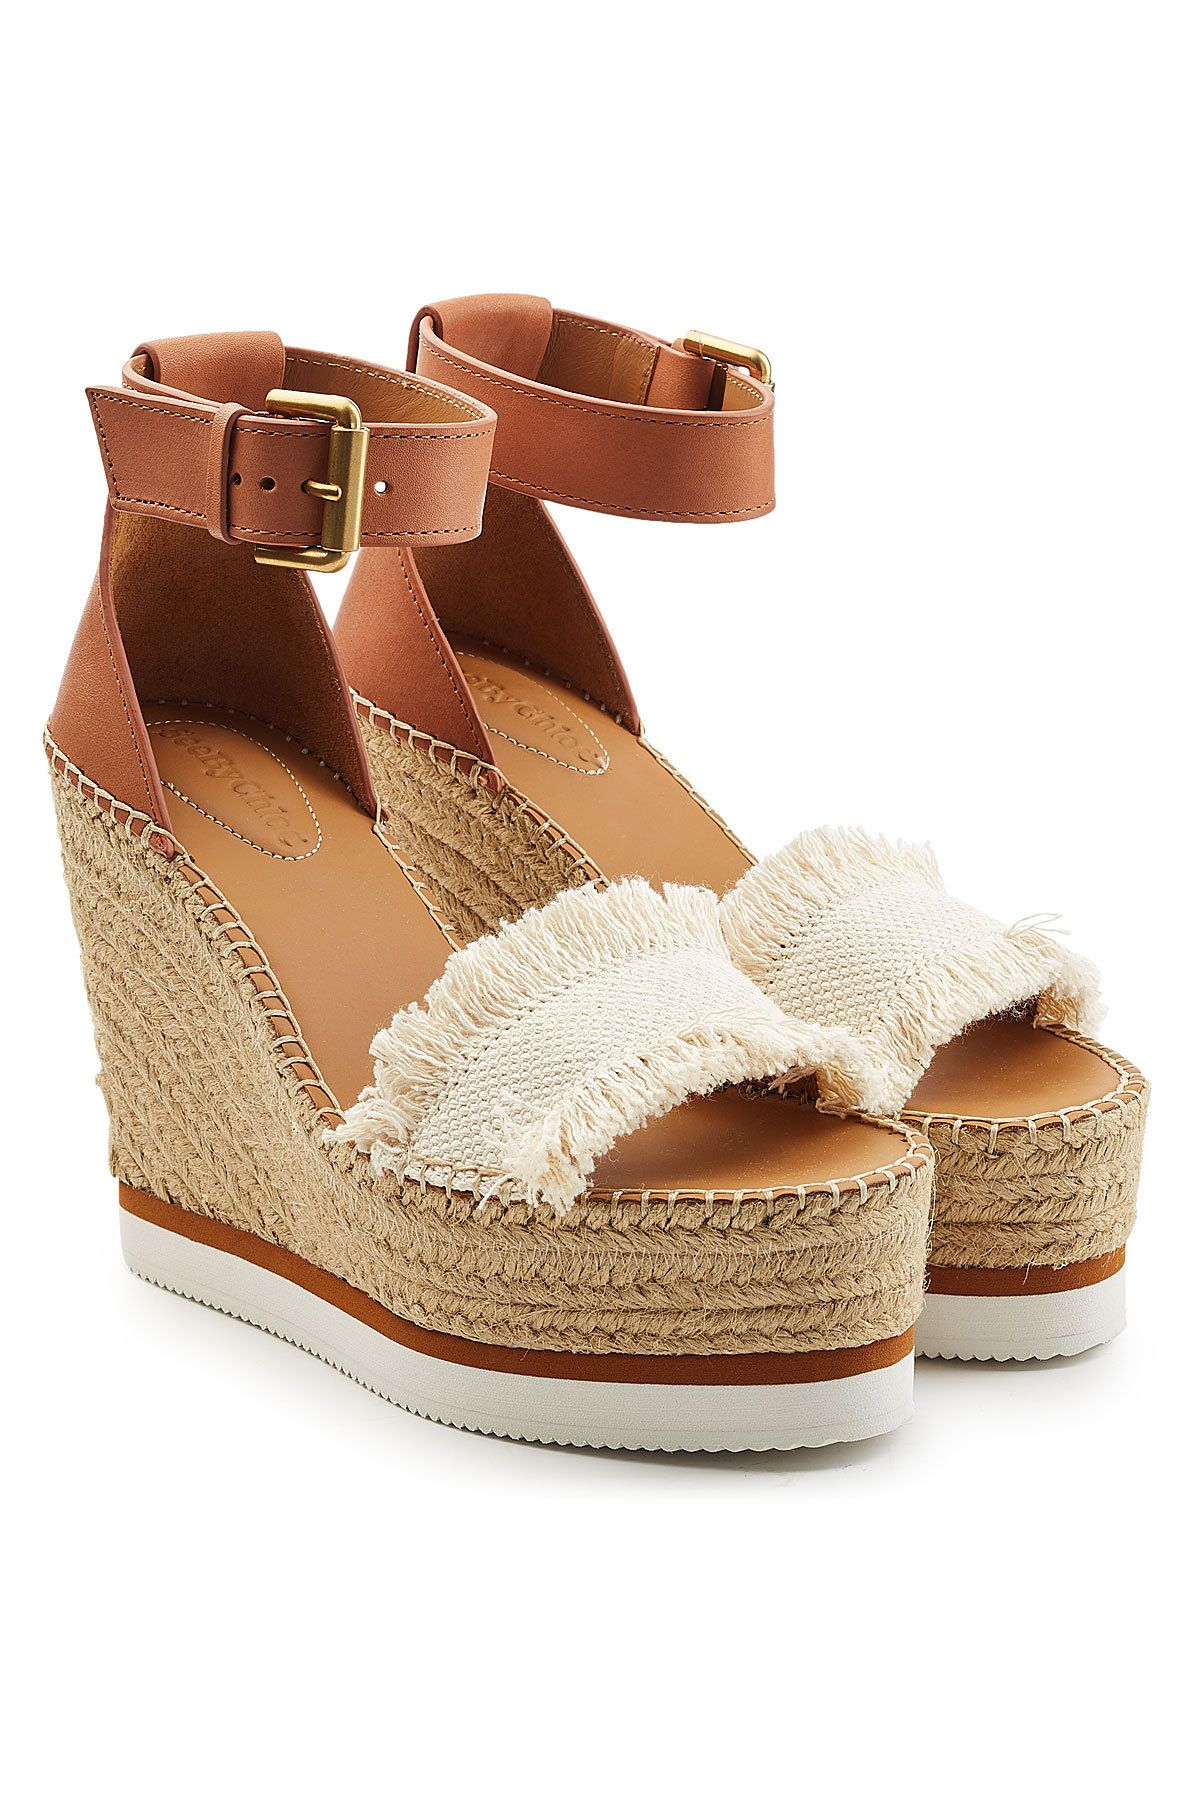 By Wedge With Leatherseebychloéshoes Sandals See Chloé pSqzMVU